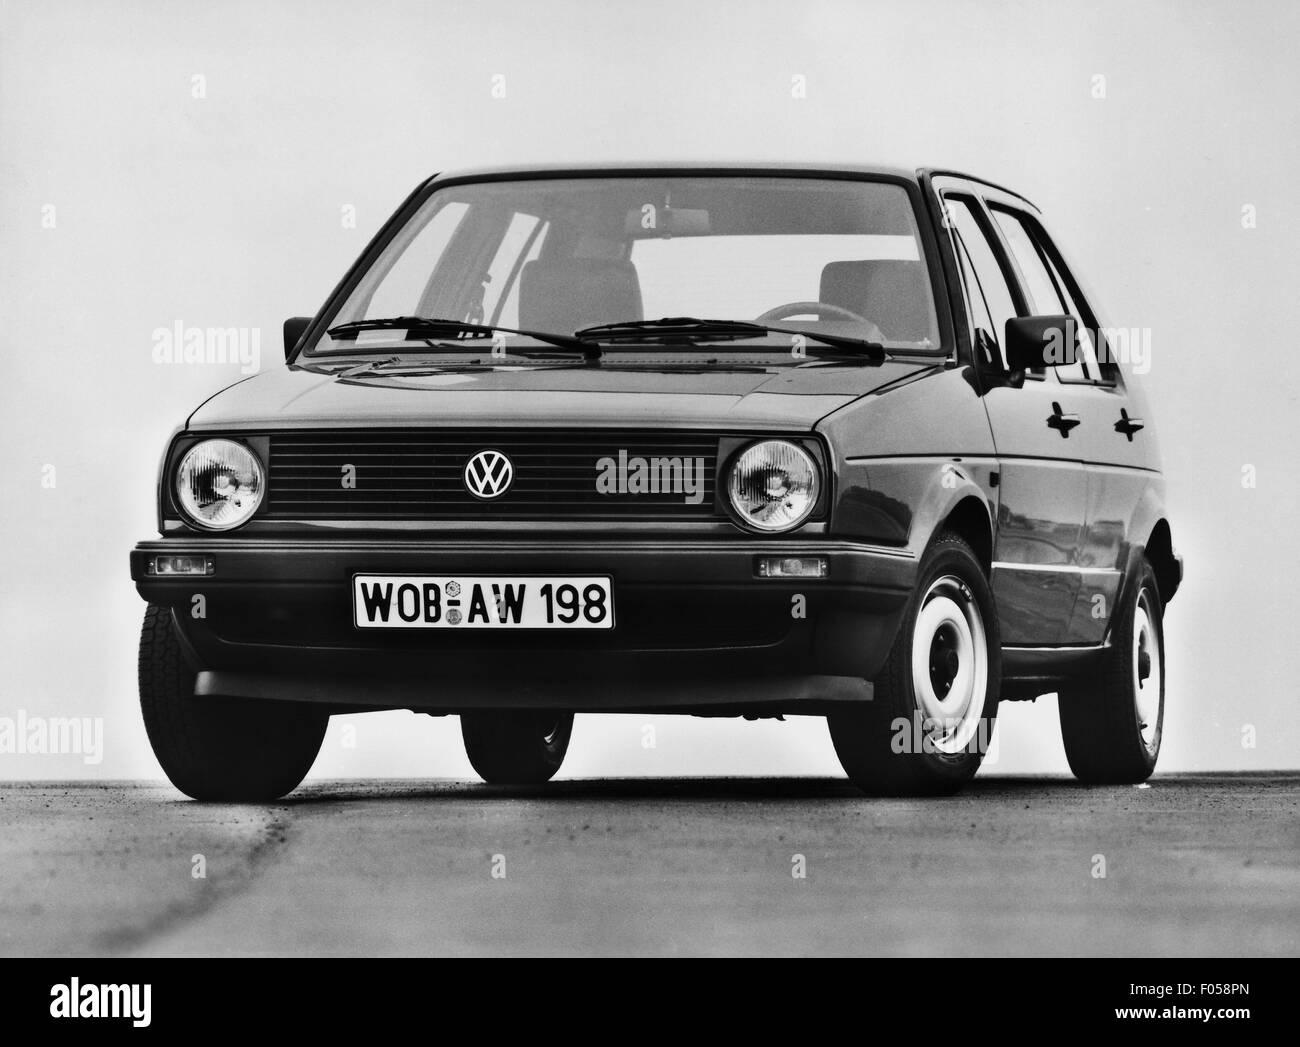 transport / transportation, car, vehicle variants, Volkswagen, VW Golf Mk2 CL, 1980s, Additional-Rights-Clearences - Stock Image